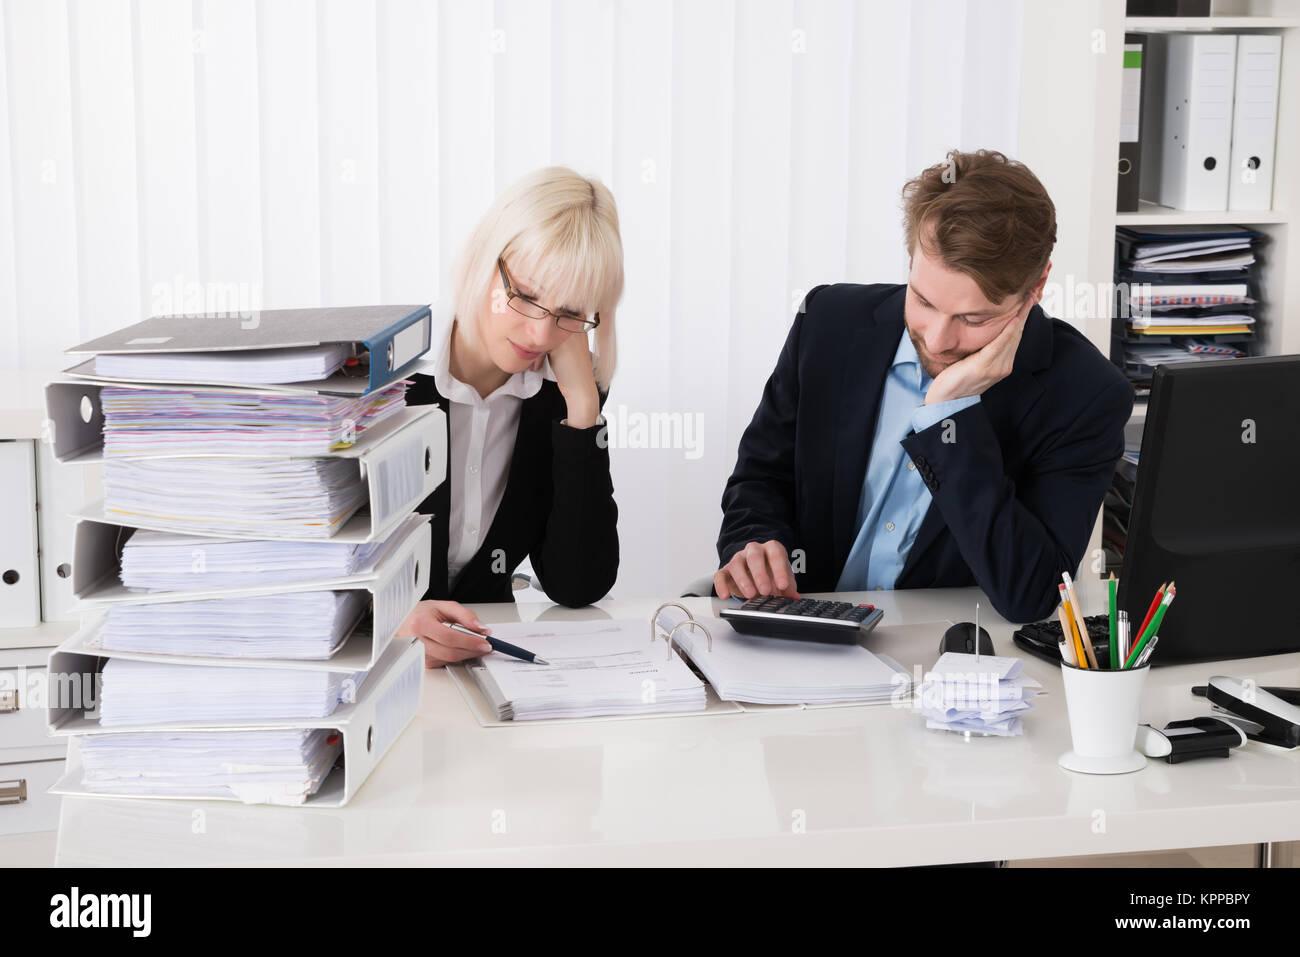 Factures Calcul d'affaires Photo Stock